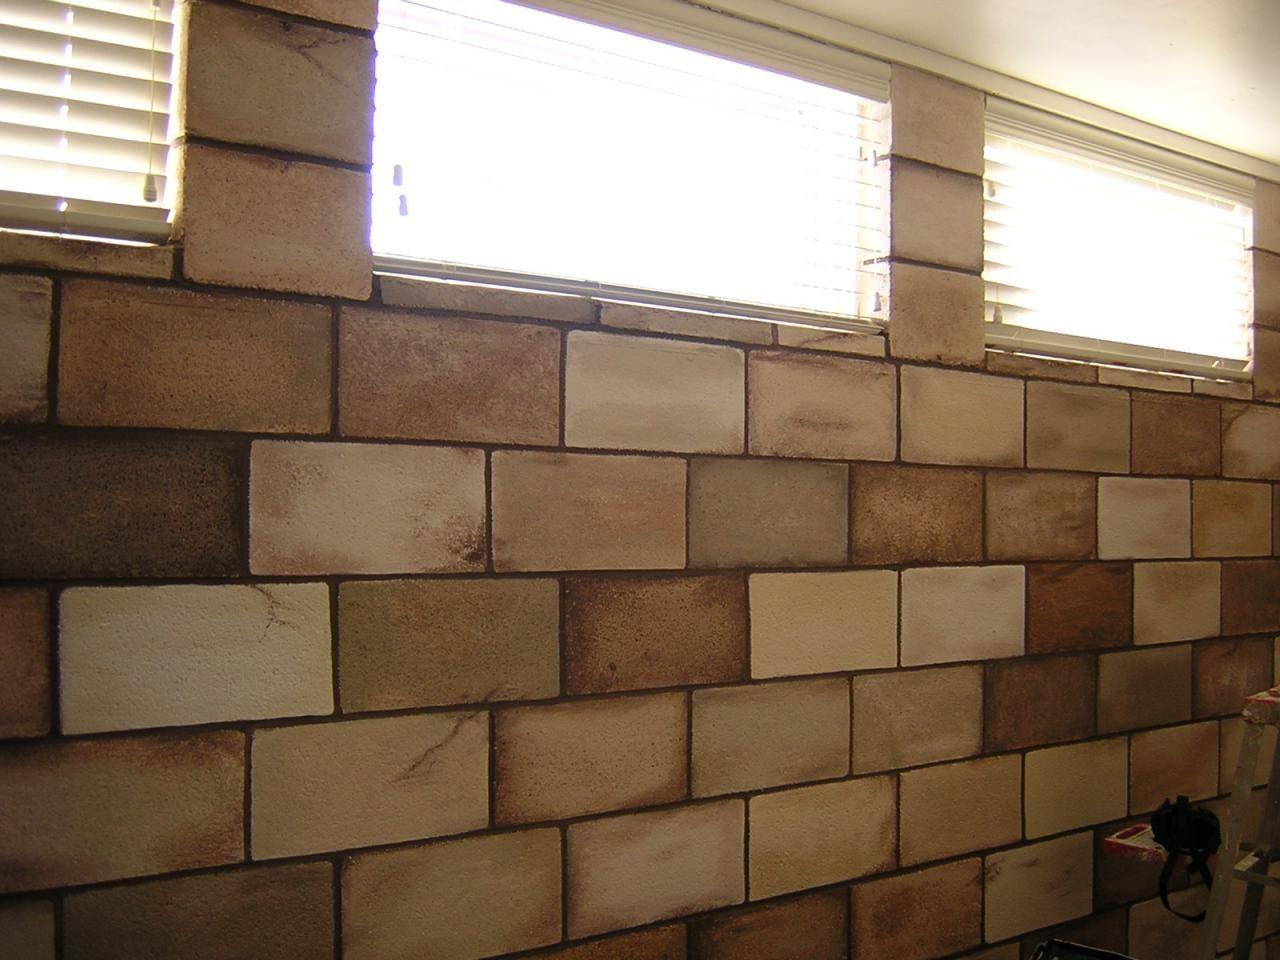 Decorating Ideas For Concrete Block Walls Cinder Block Walls Painting Concrete Concrete Block Walls